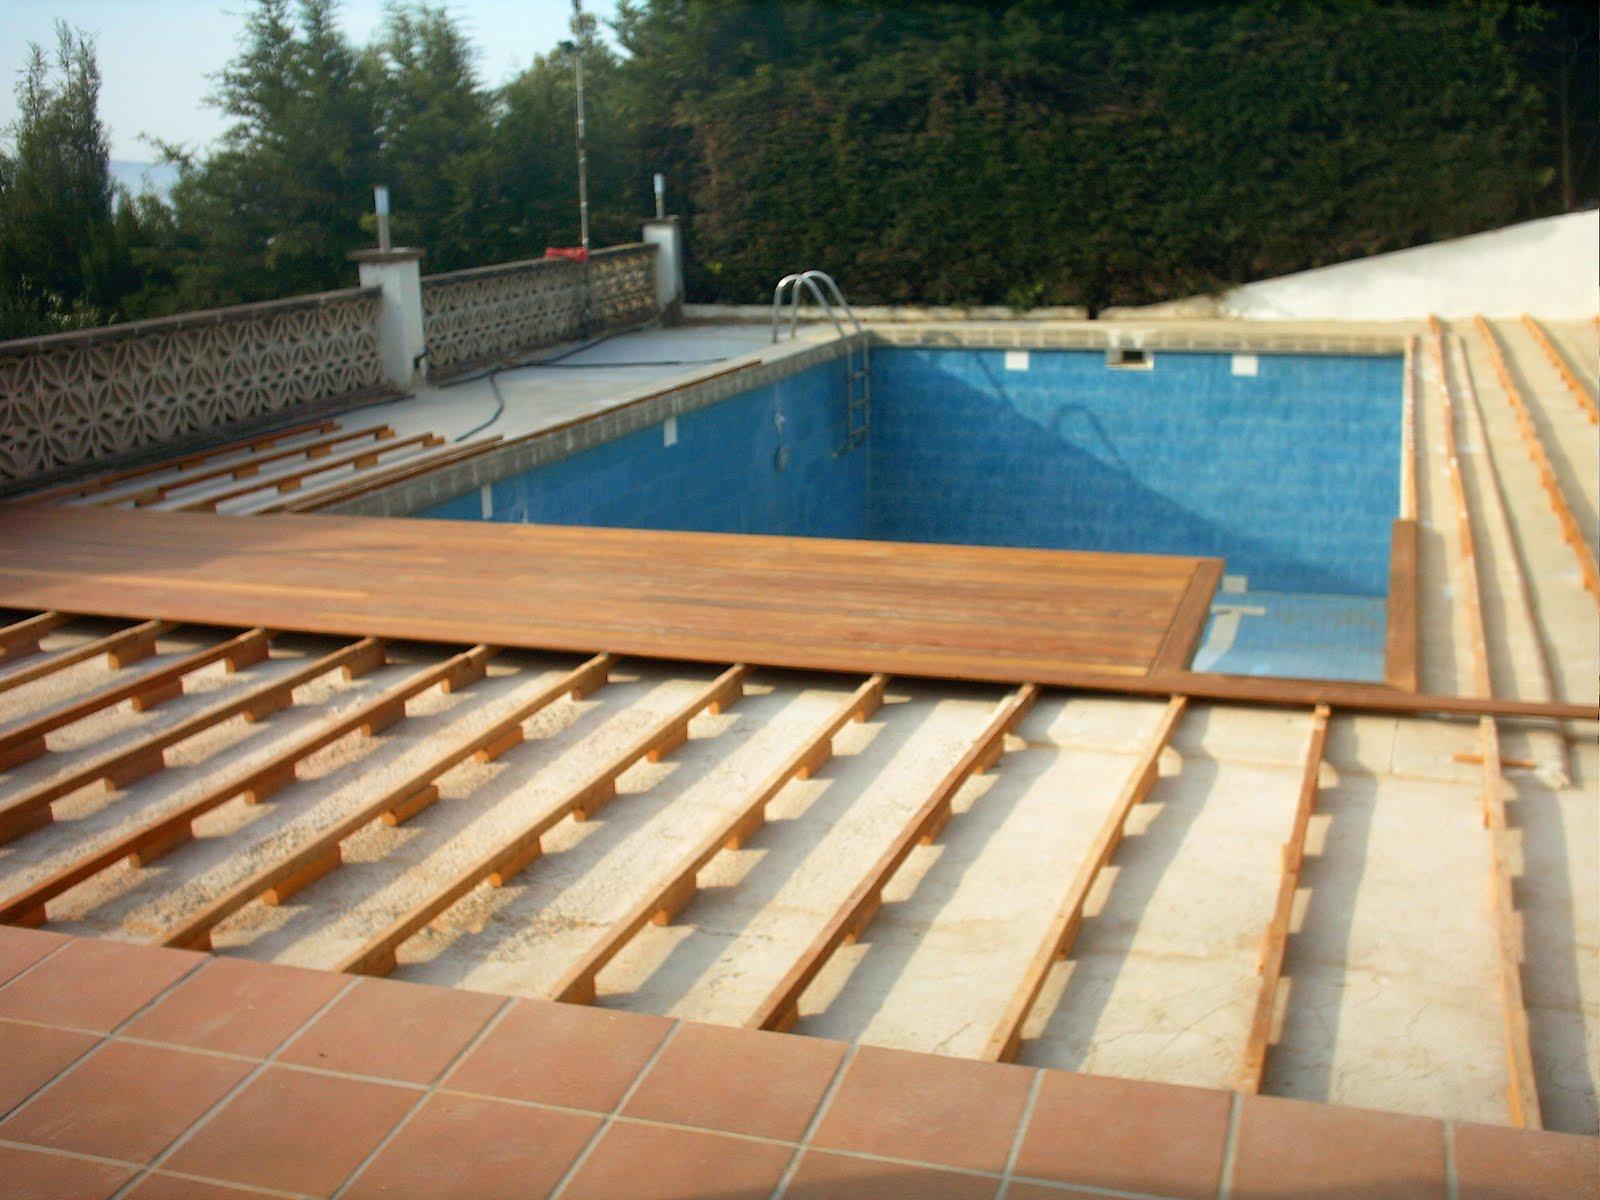 Ca uelo e hijos carpinteria s c p terraza y jardin - Tarima para terraza ...